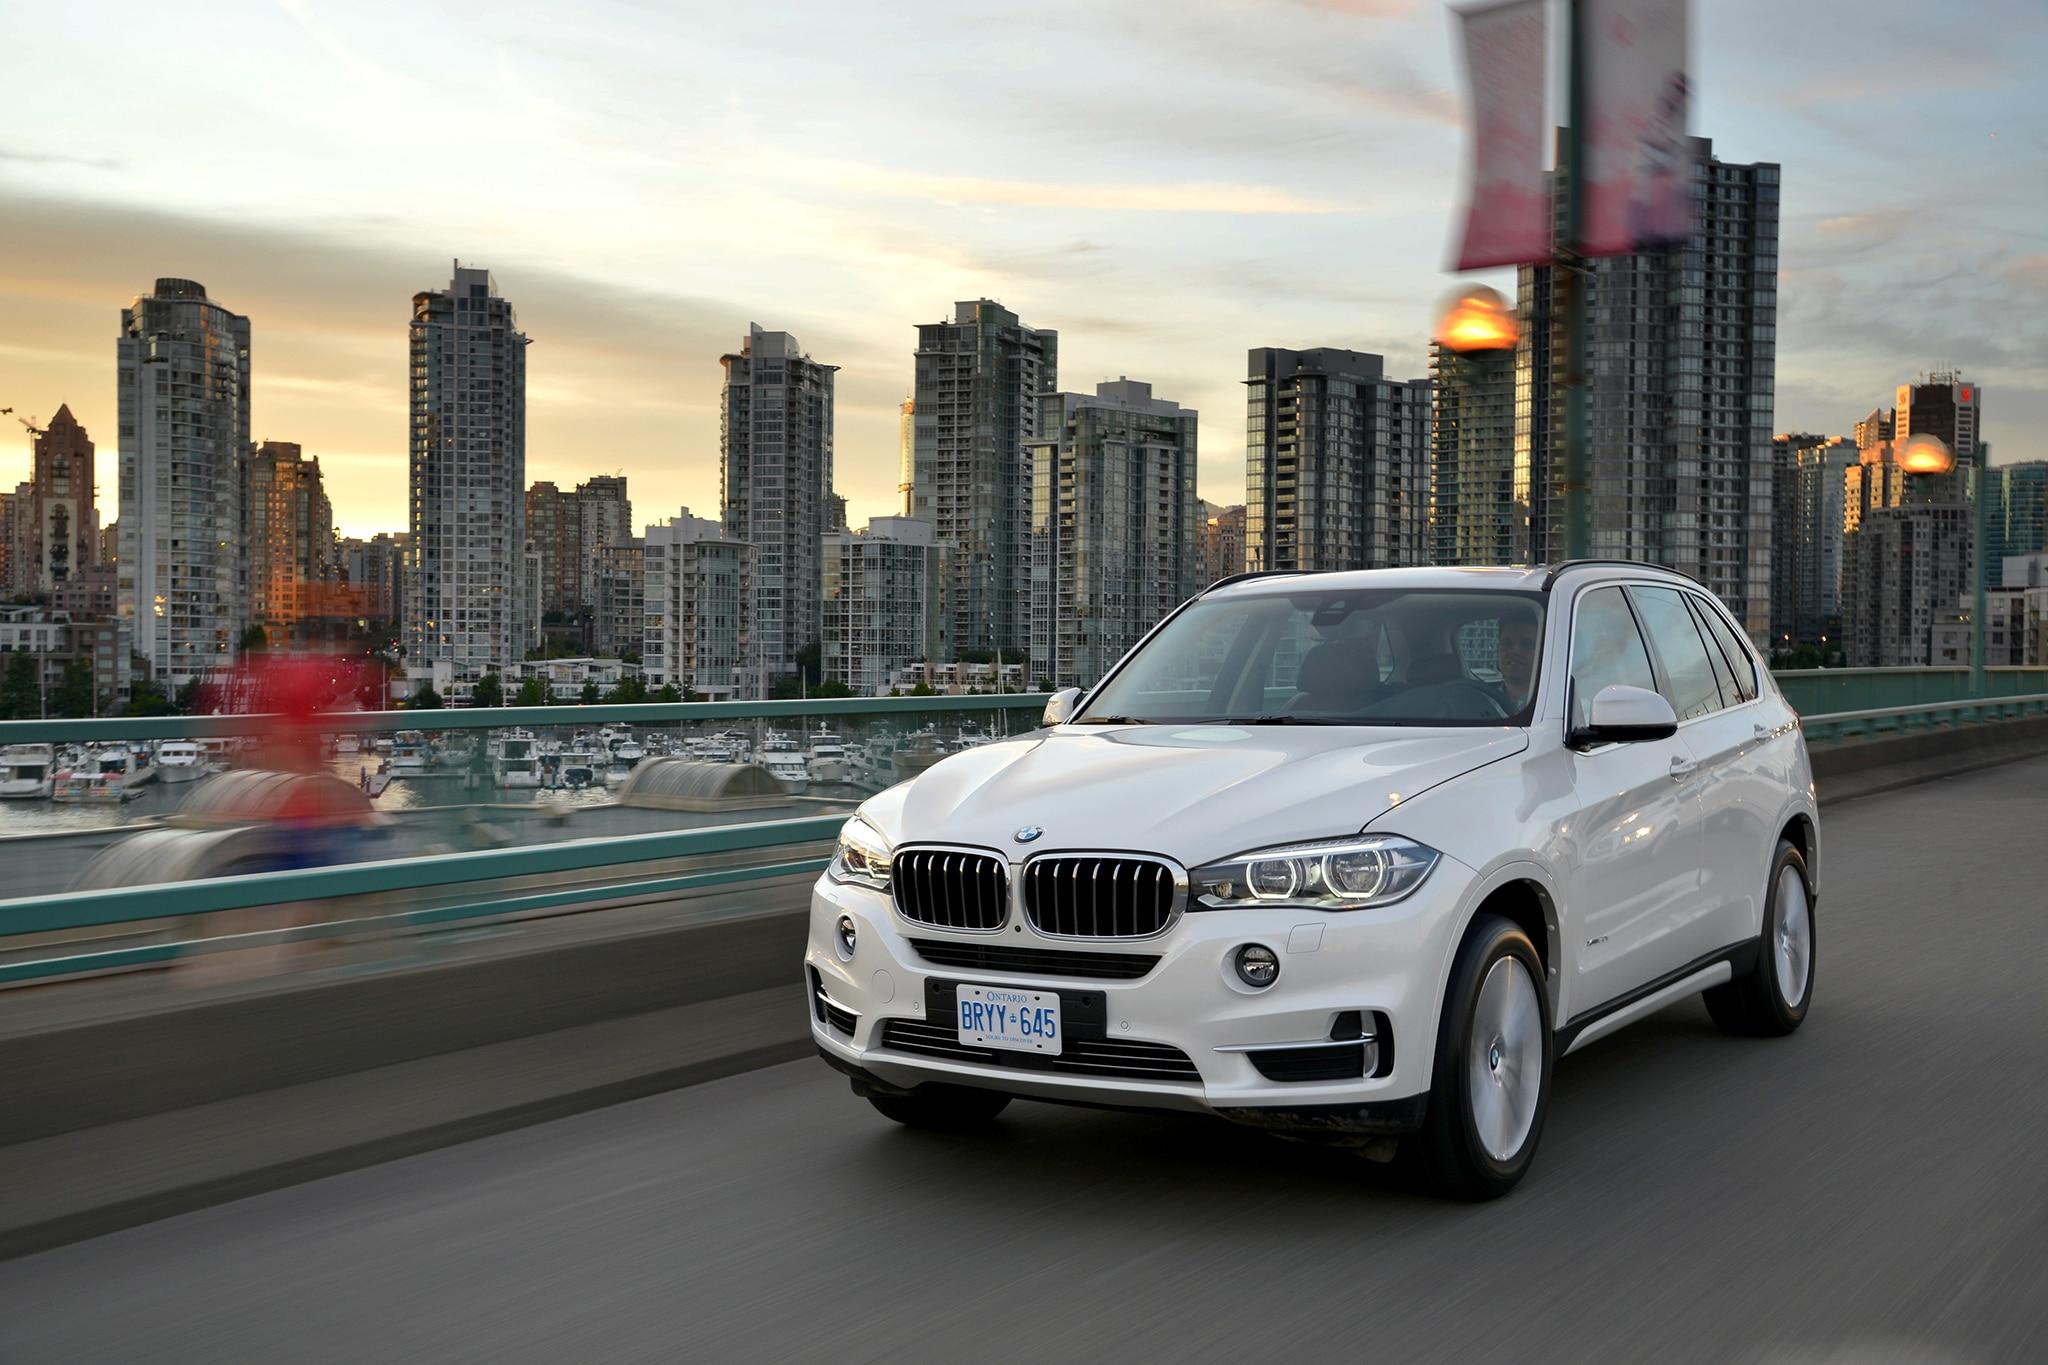 2015 Bmw Lineup Receives Minor Updates Automobile Magazine